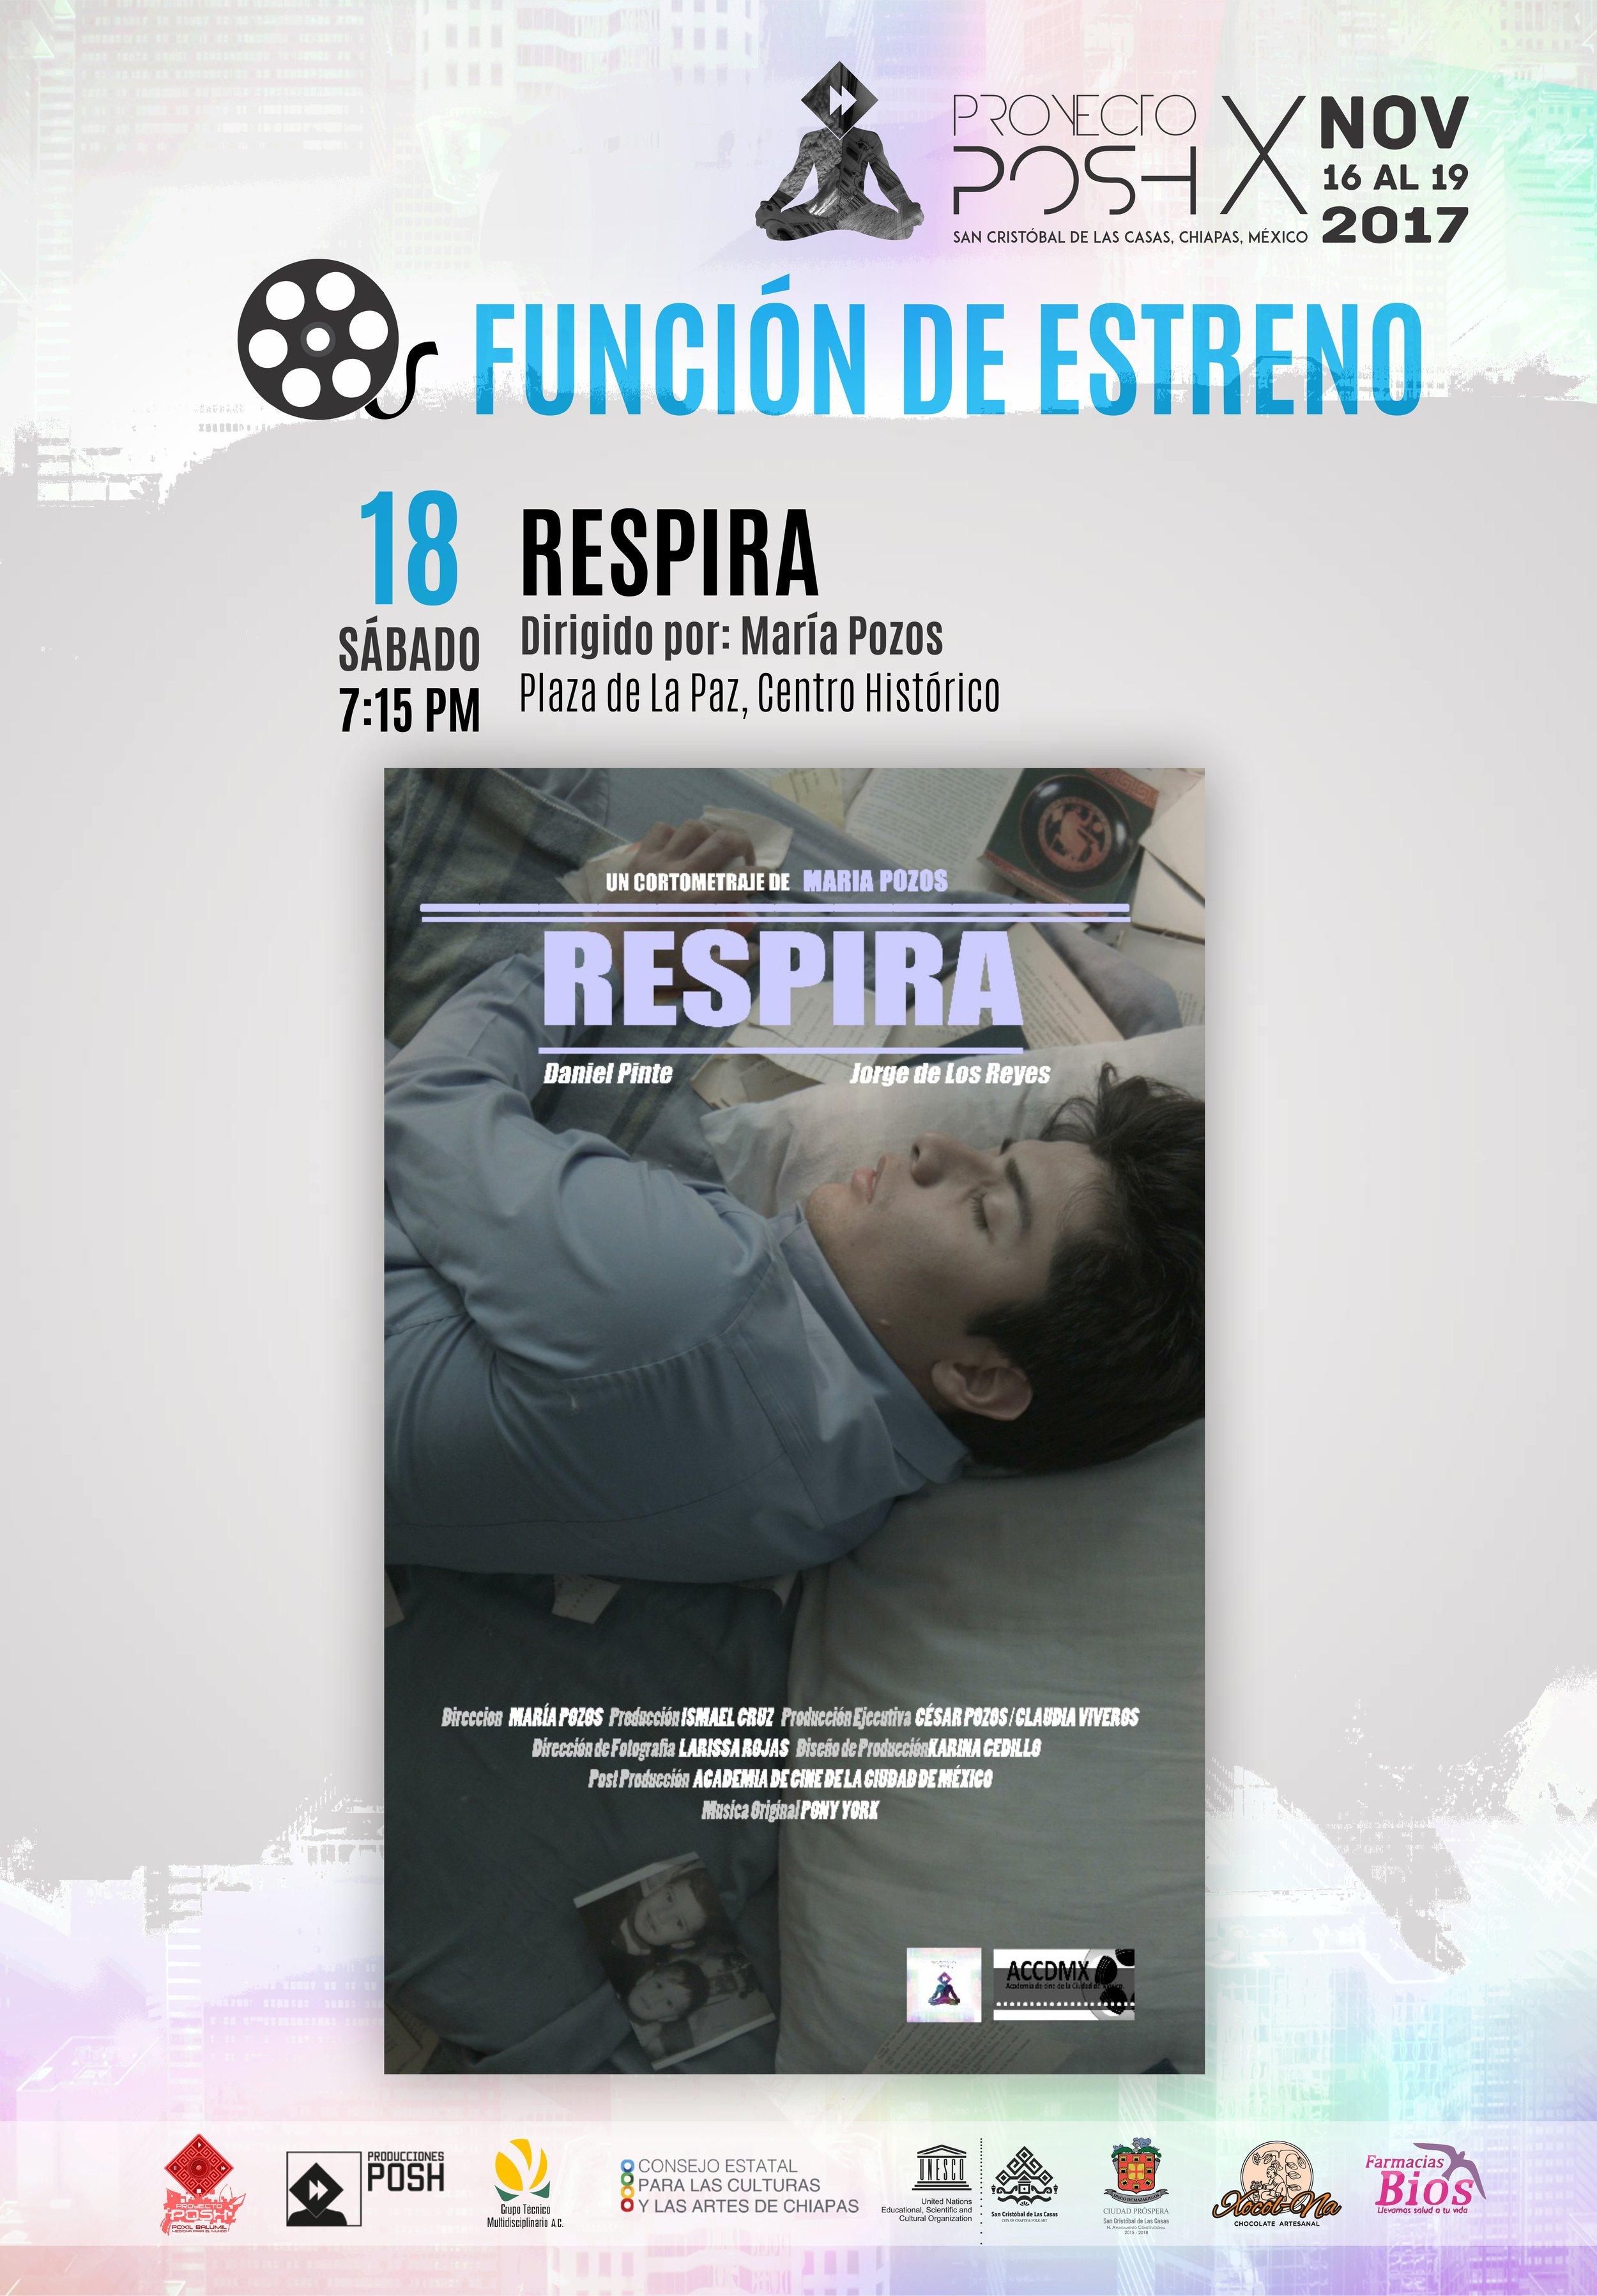 RESPIRA_CORTO.jpg